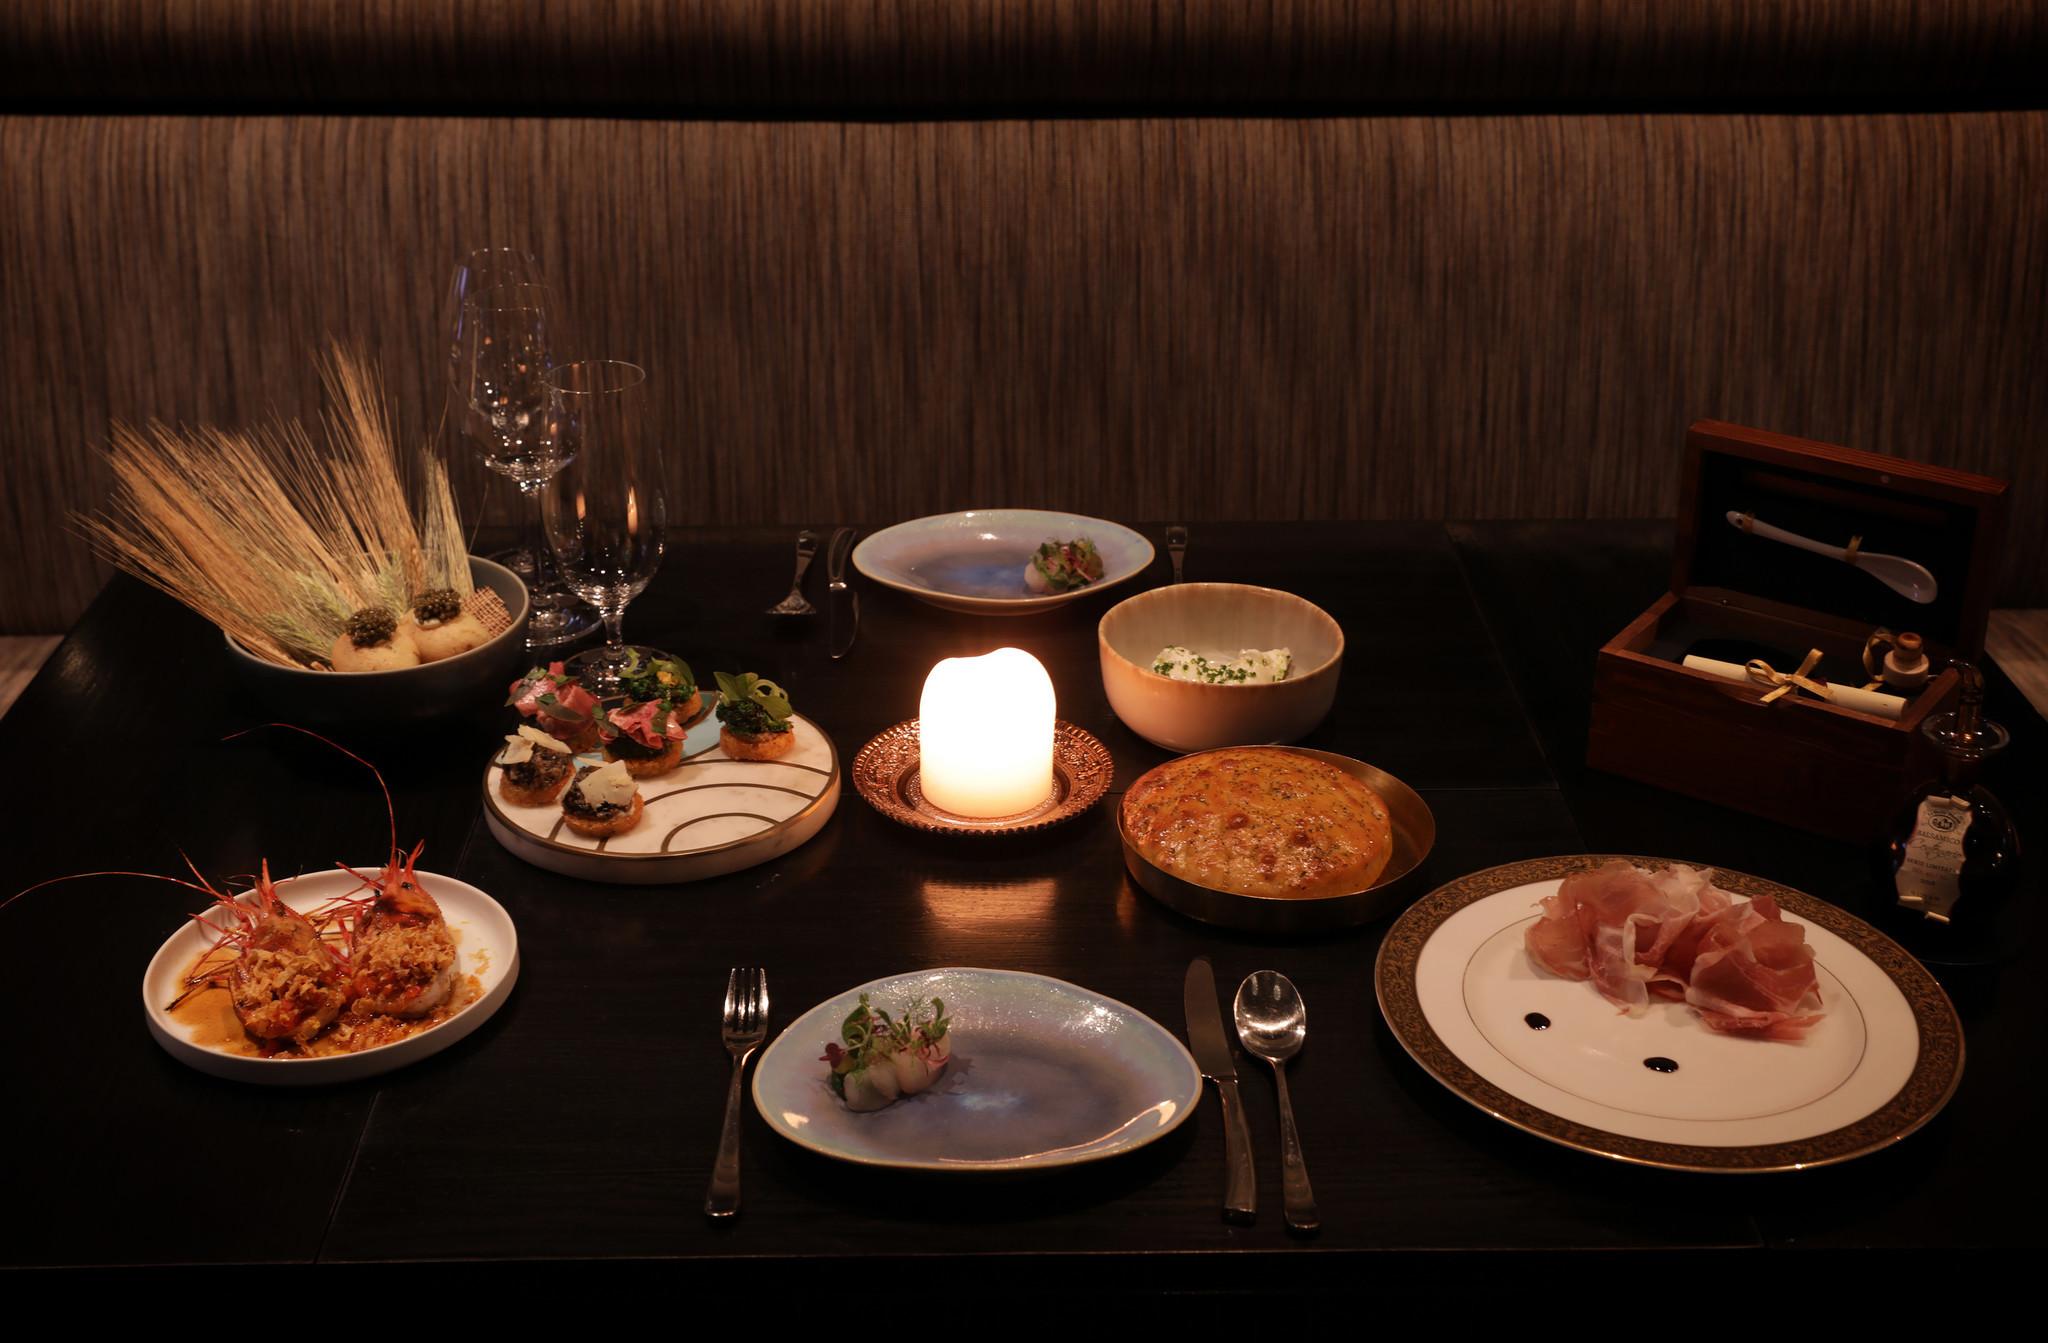 Review: Abbondanza rules the day at Next restaurant's Italia menu